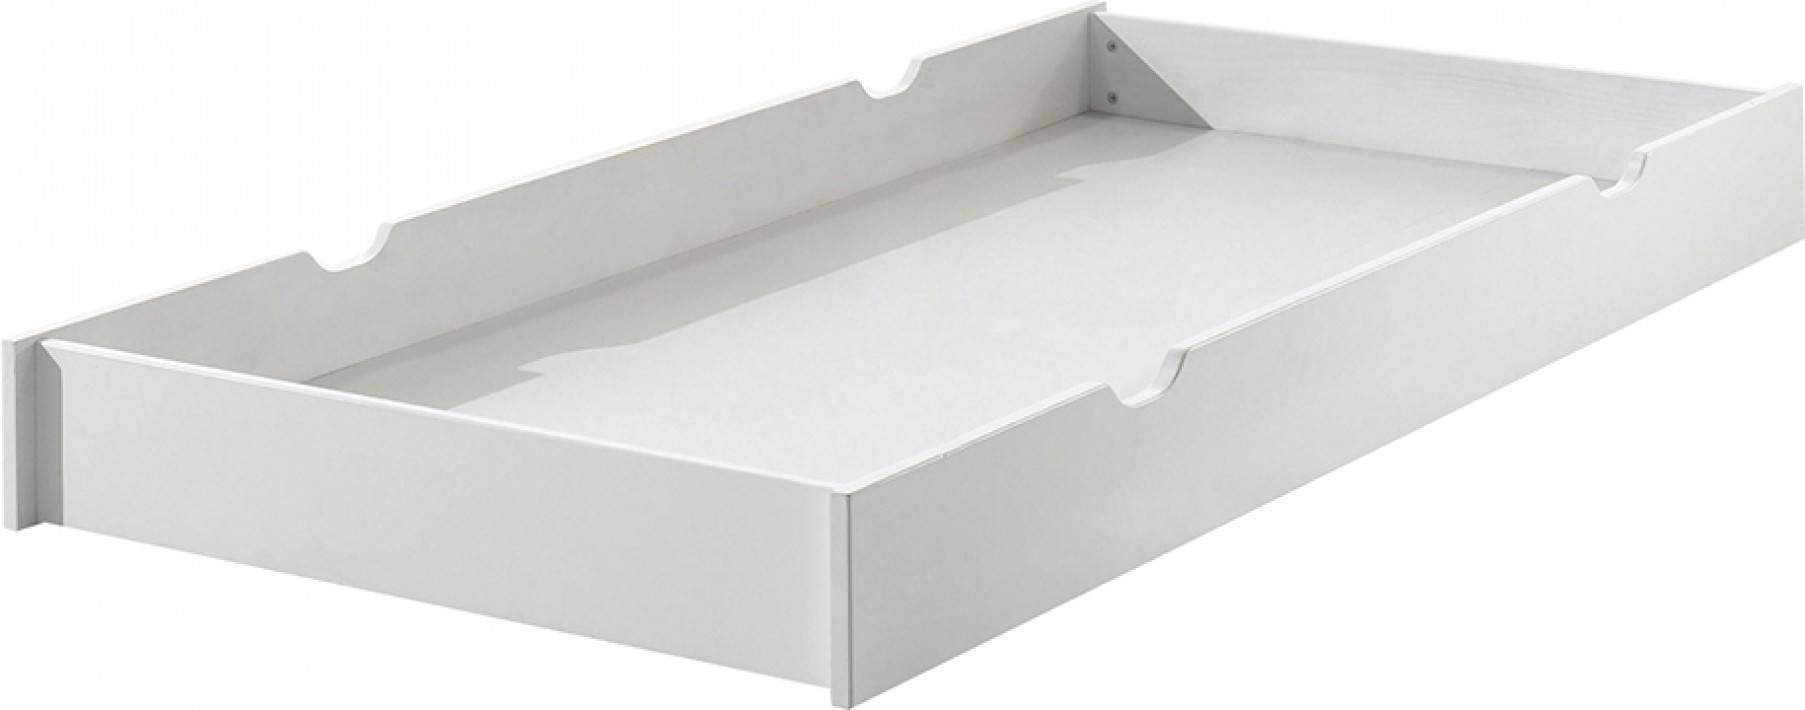 Tiroir lit enfant blanc - ERIK